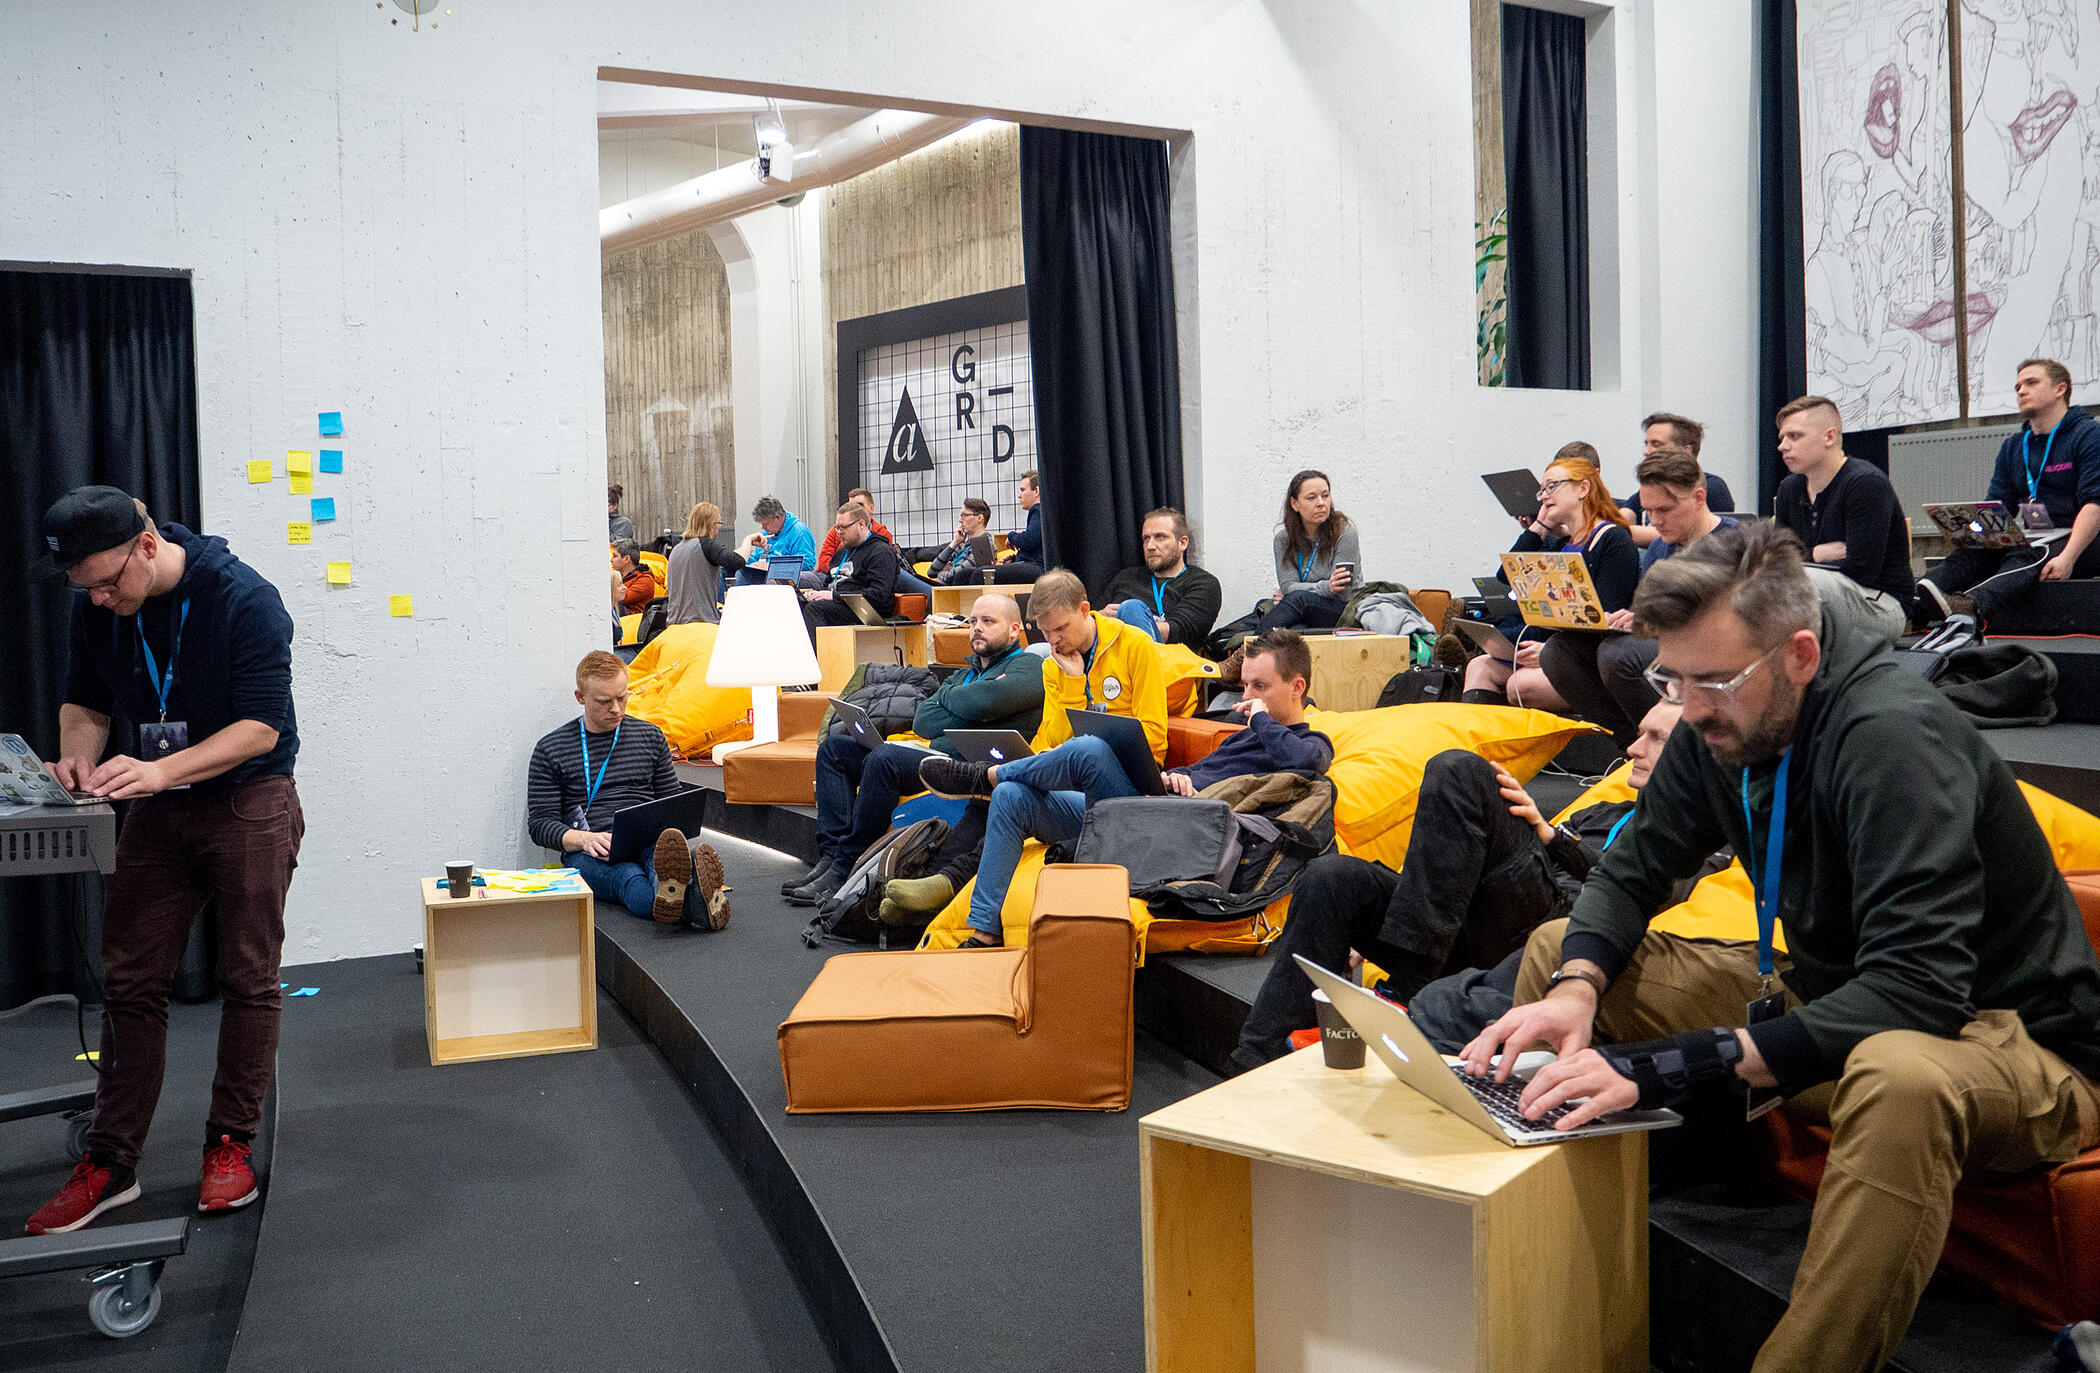 WordCamp Nordic yhteisö